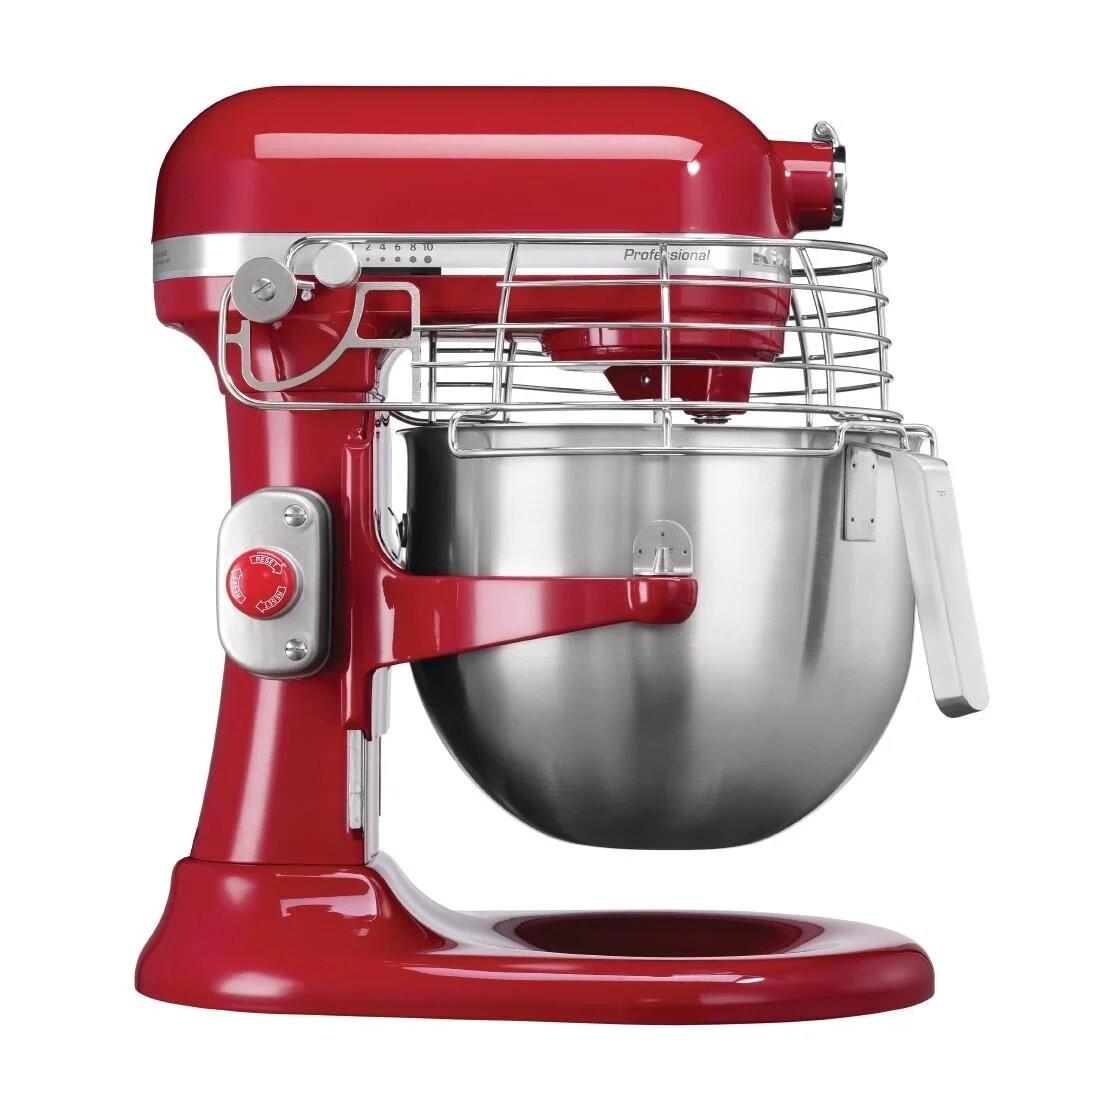 KitchenAid 5KSM7990XBER Professional Stand Mixer 6.9 Litre Red - CB576